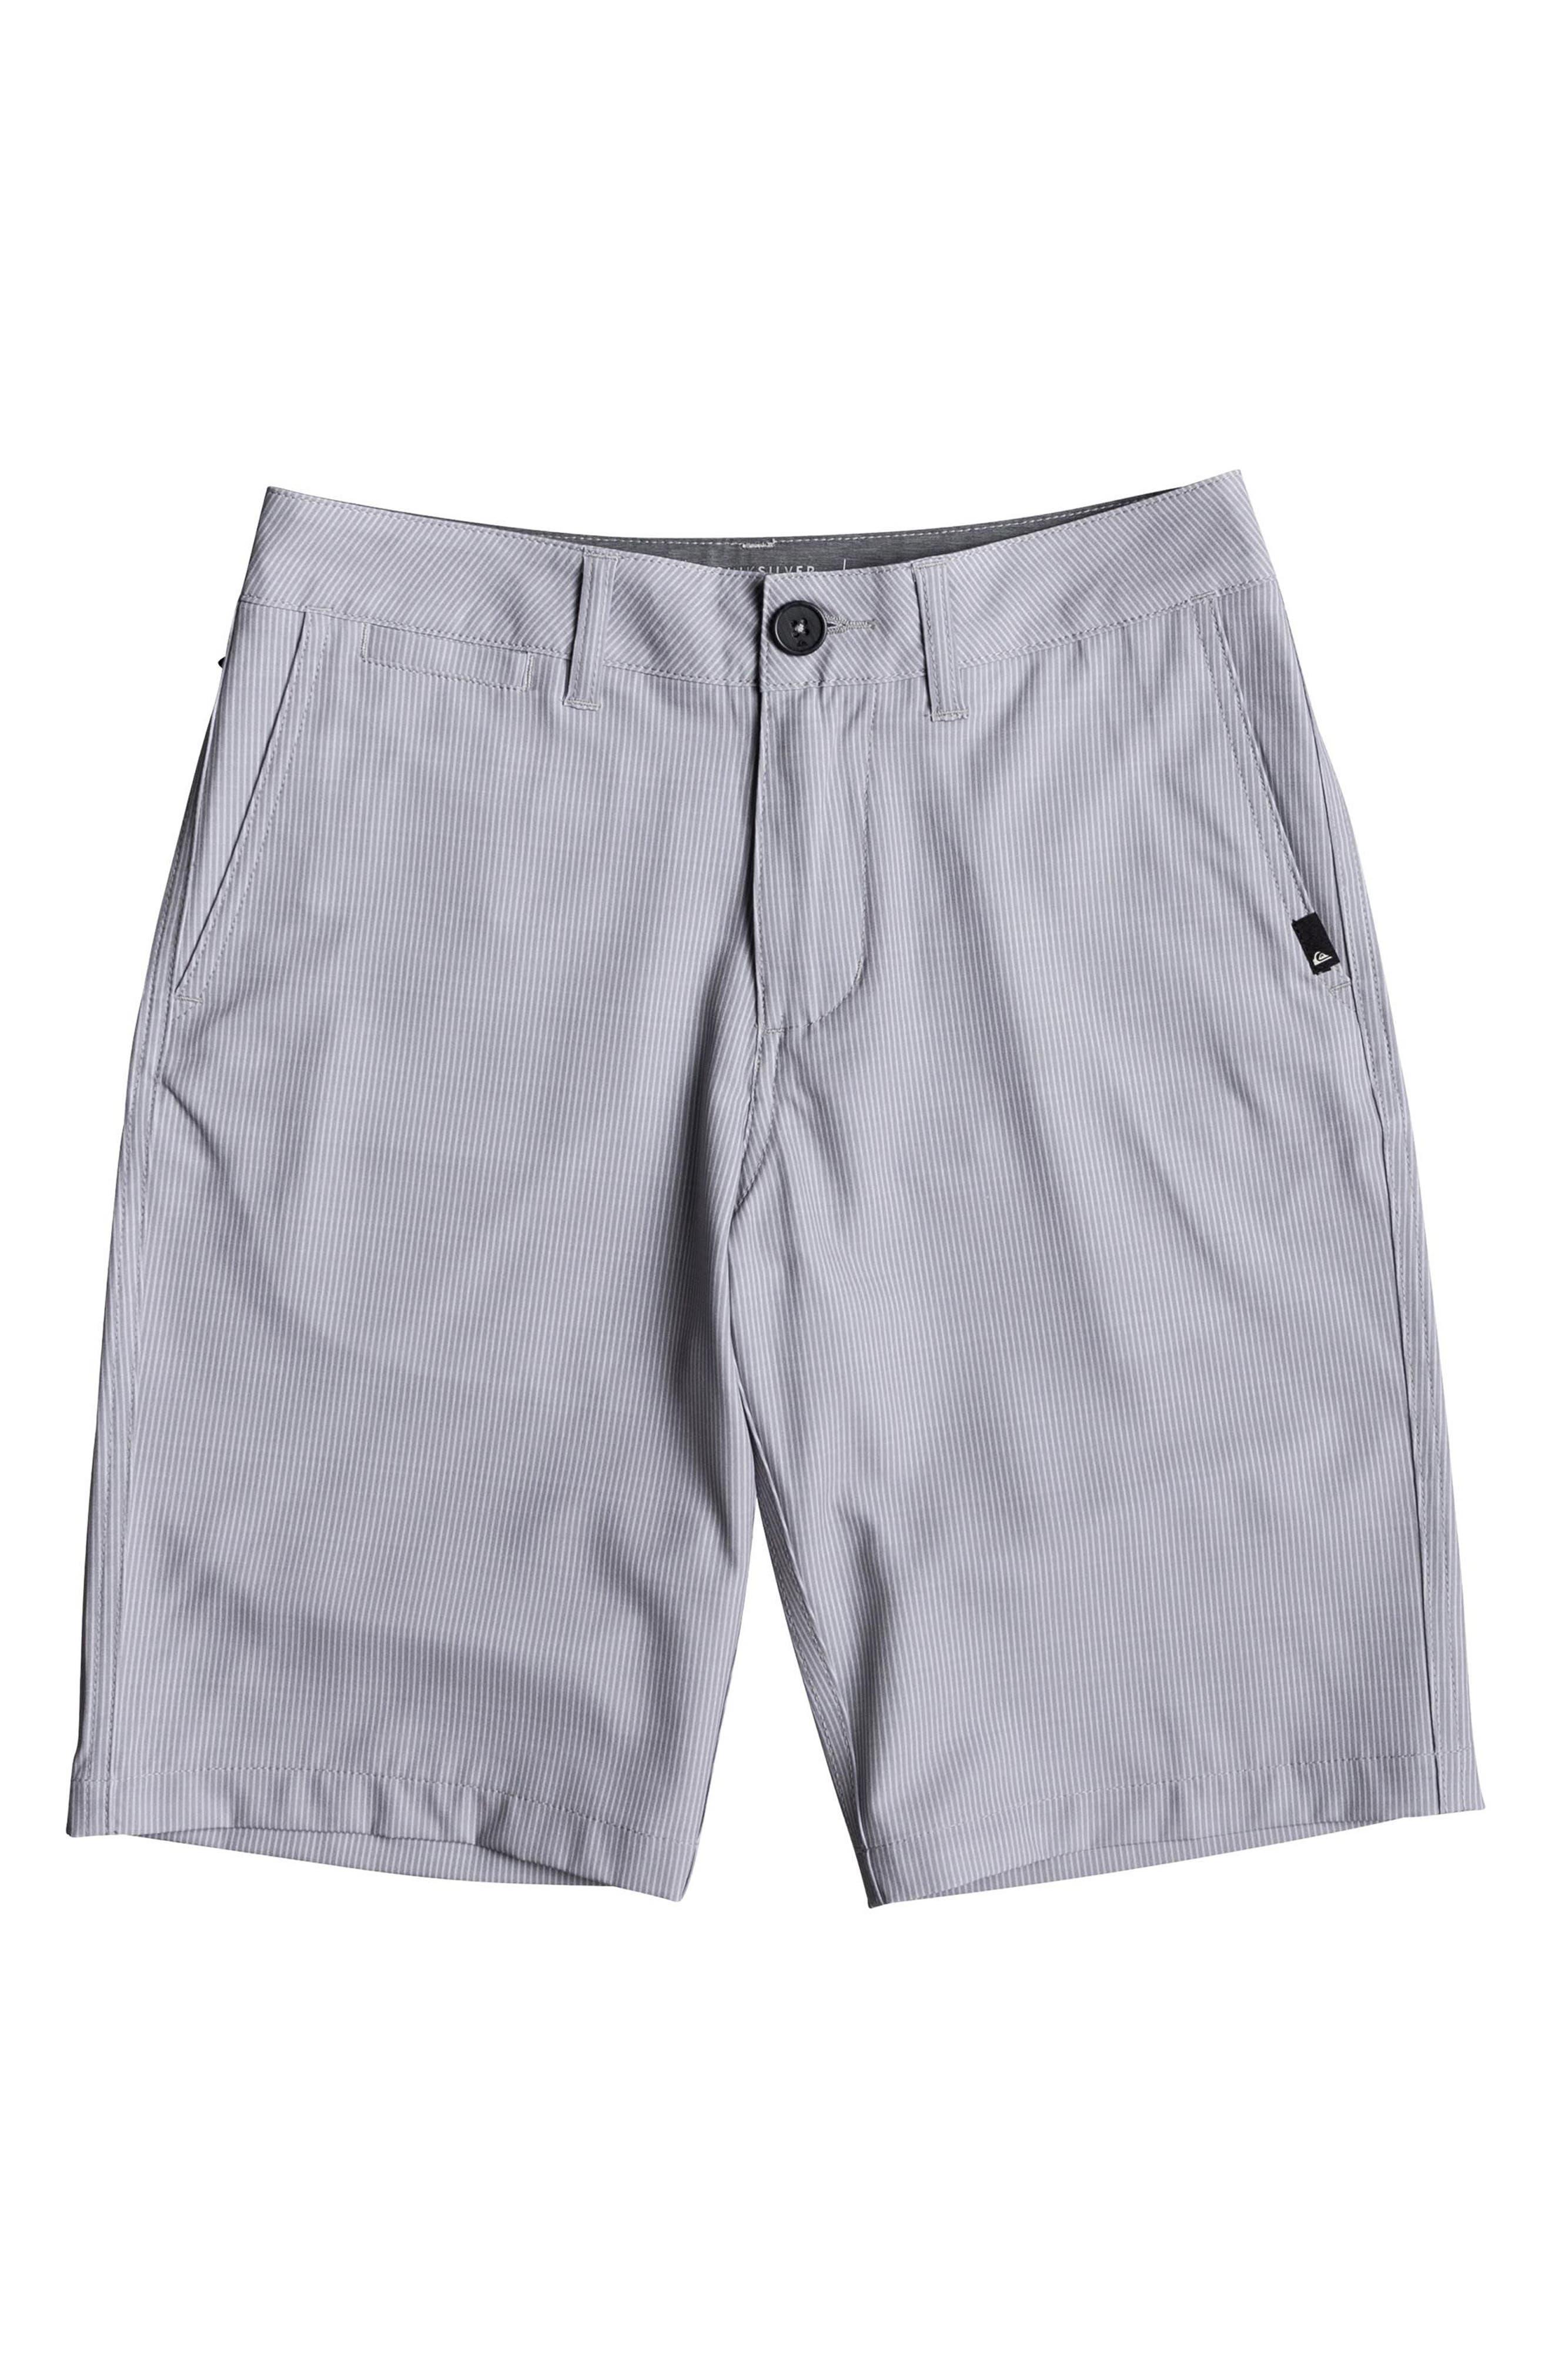 Union Pinstripe Amphibian Hybrid Shorts,                             Main thumbnail 1, color,                             SLEET